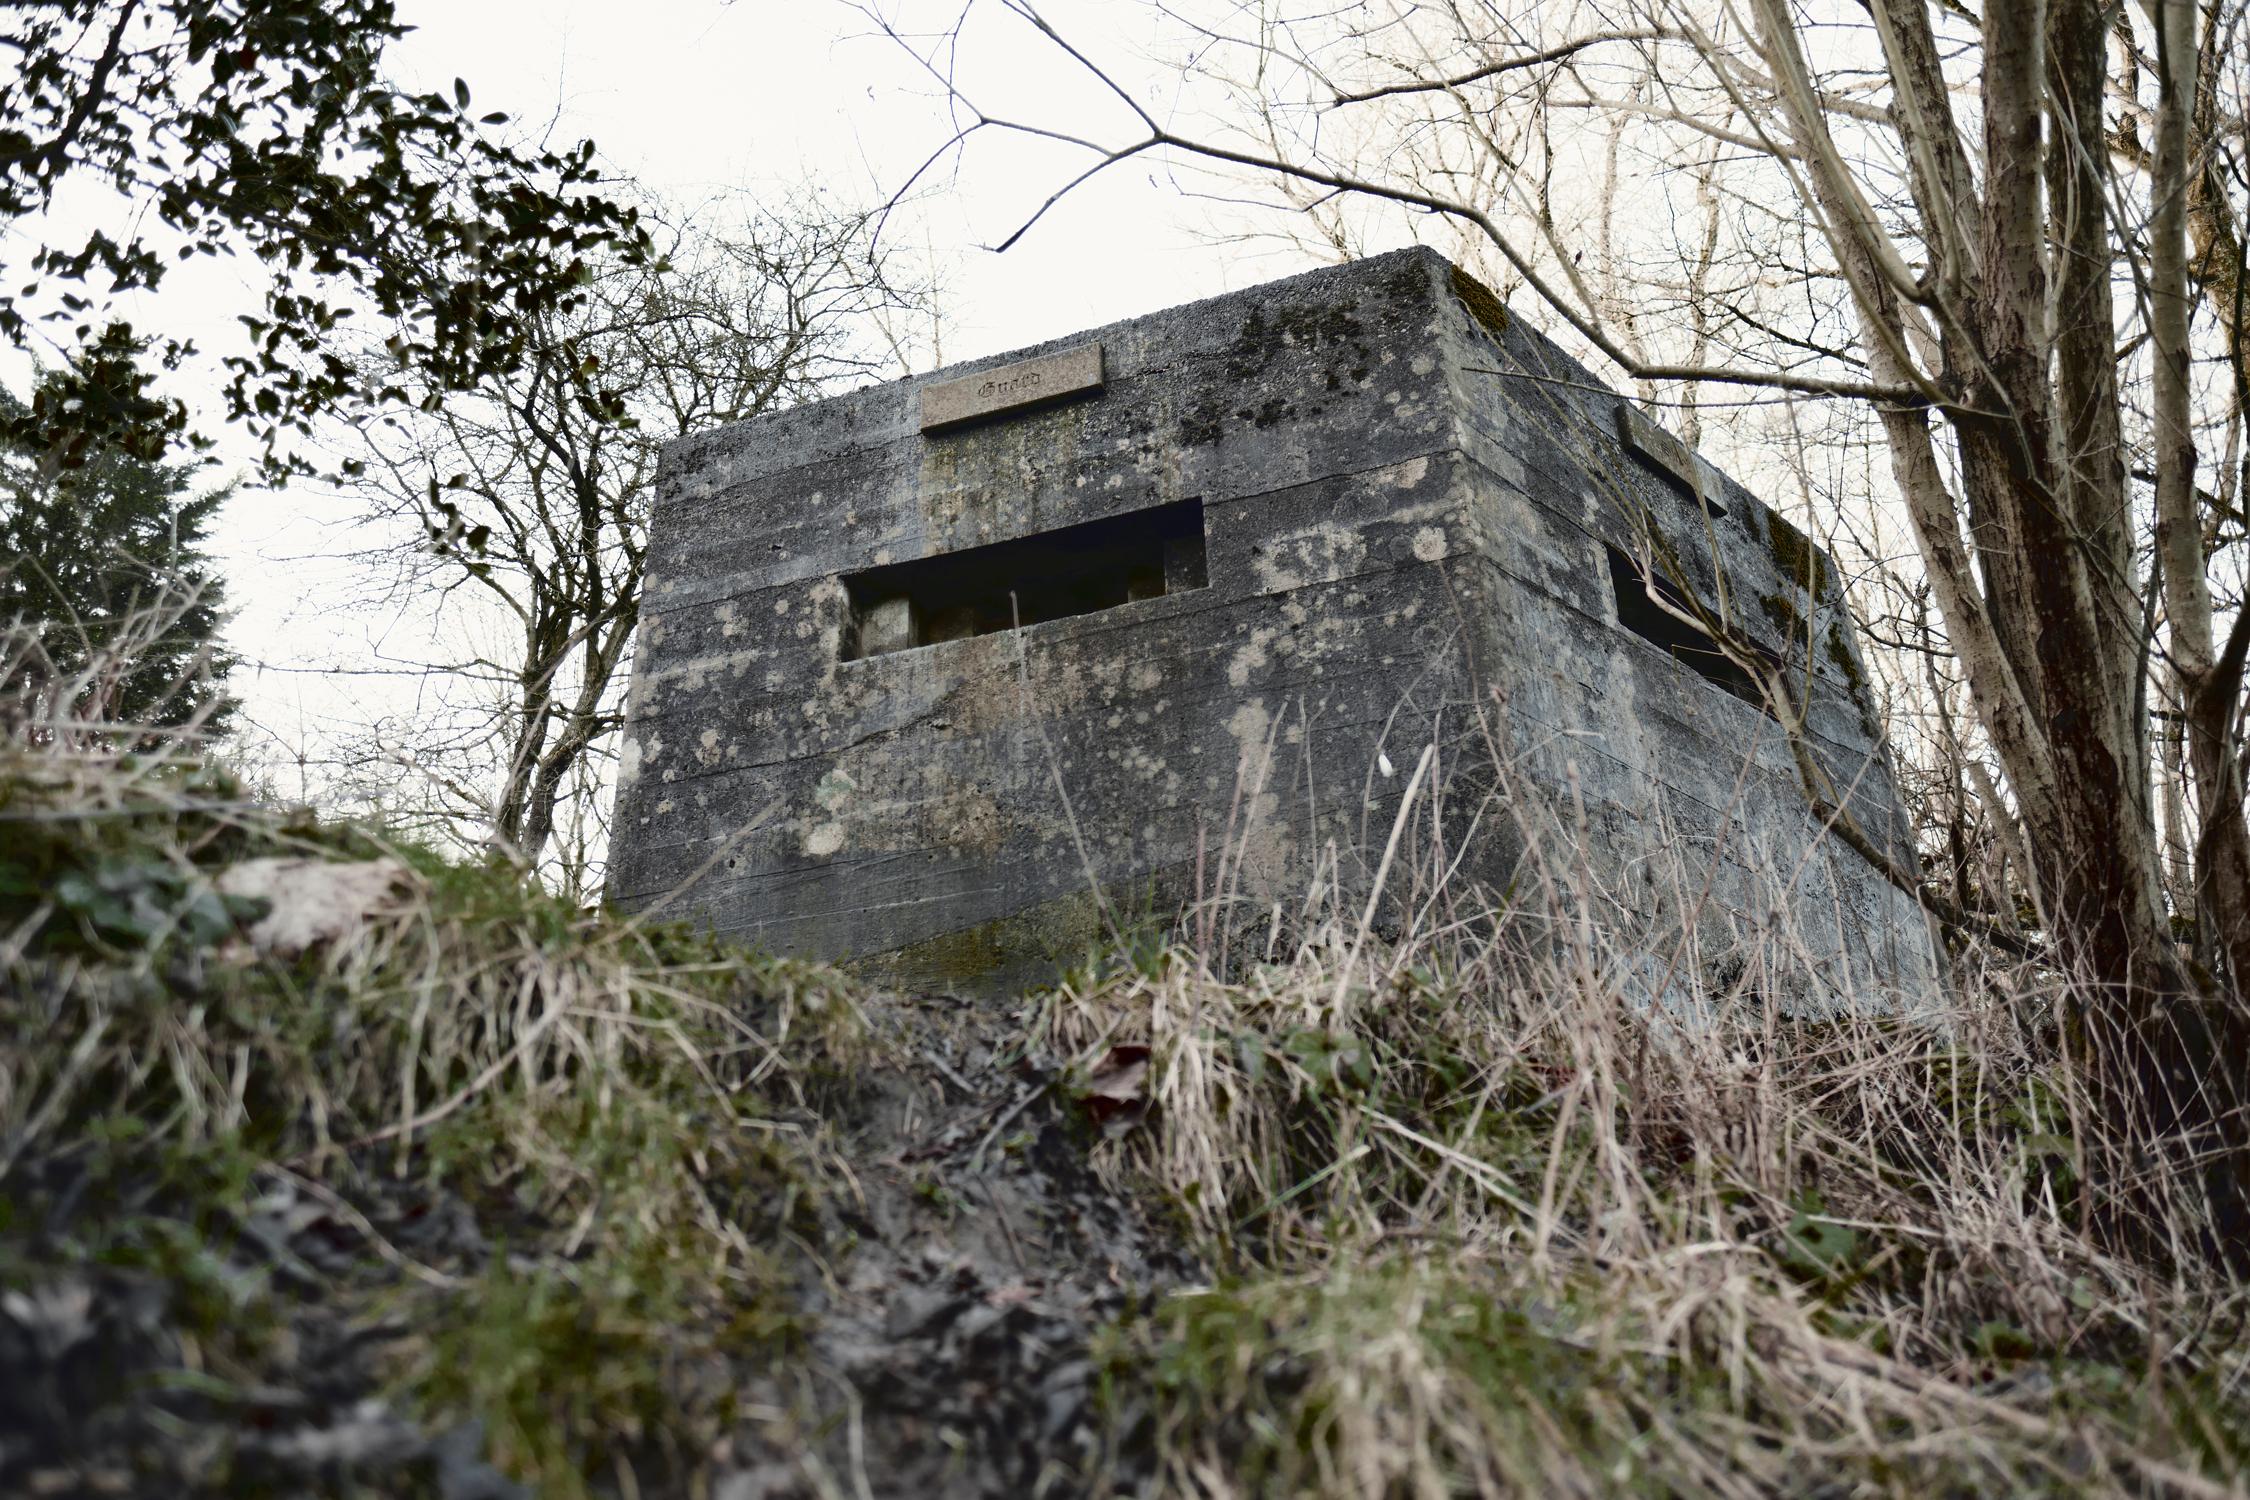 salisbury pill box 1.jpg